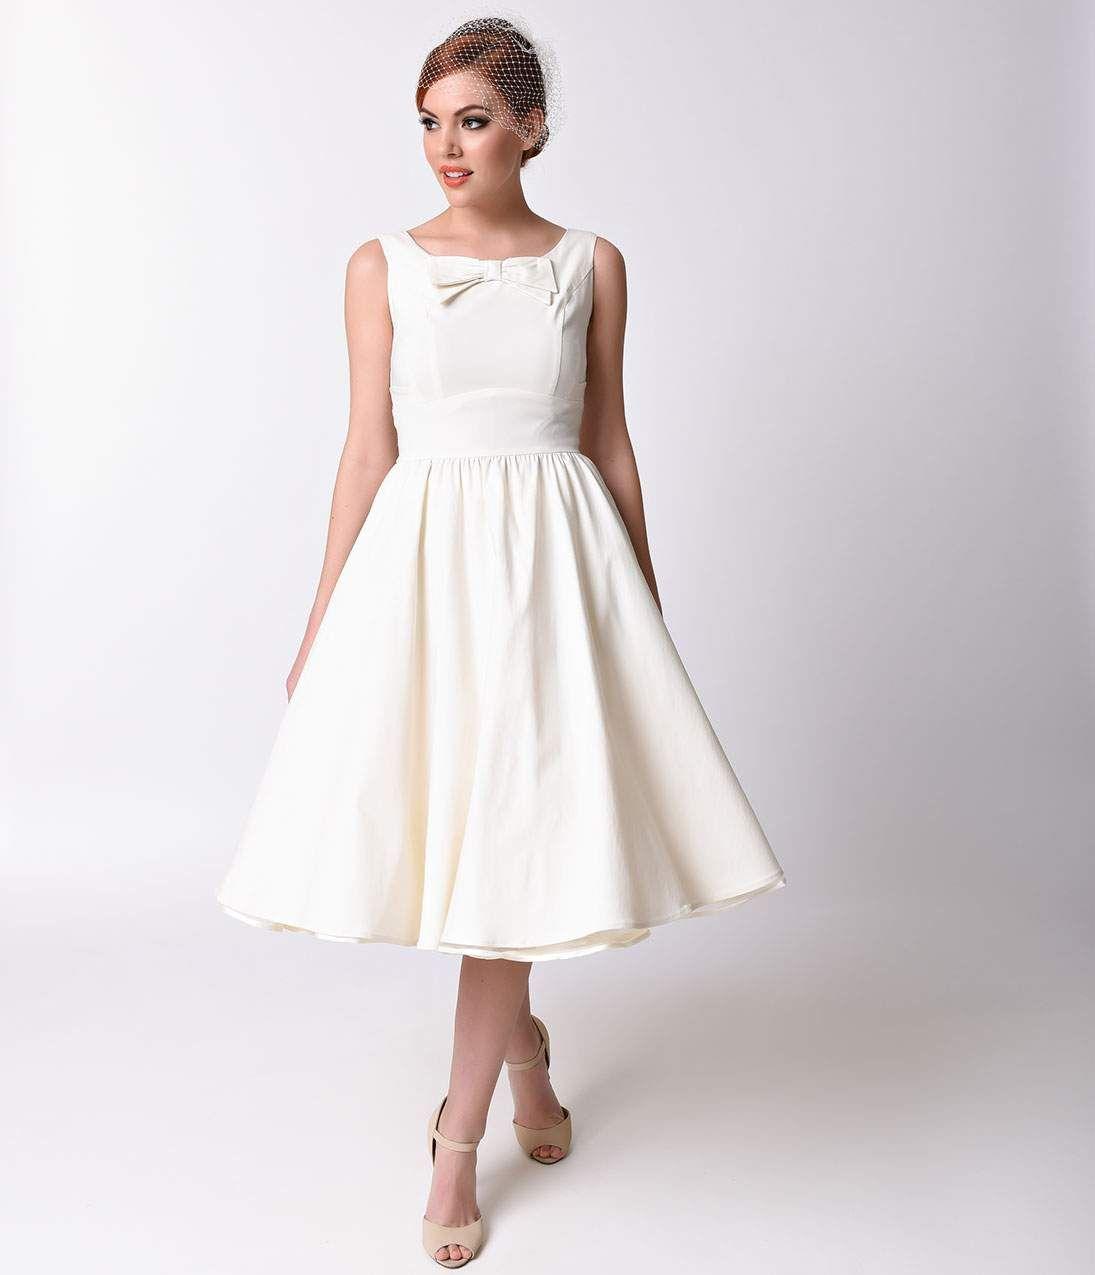 Vintage Style Wedding Dresses Vintage Inspired Wedding Gowns Vintage Style Wedding Dresses Vintage Inspired Wedding Gown Wedding Dresses Unique